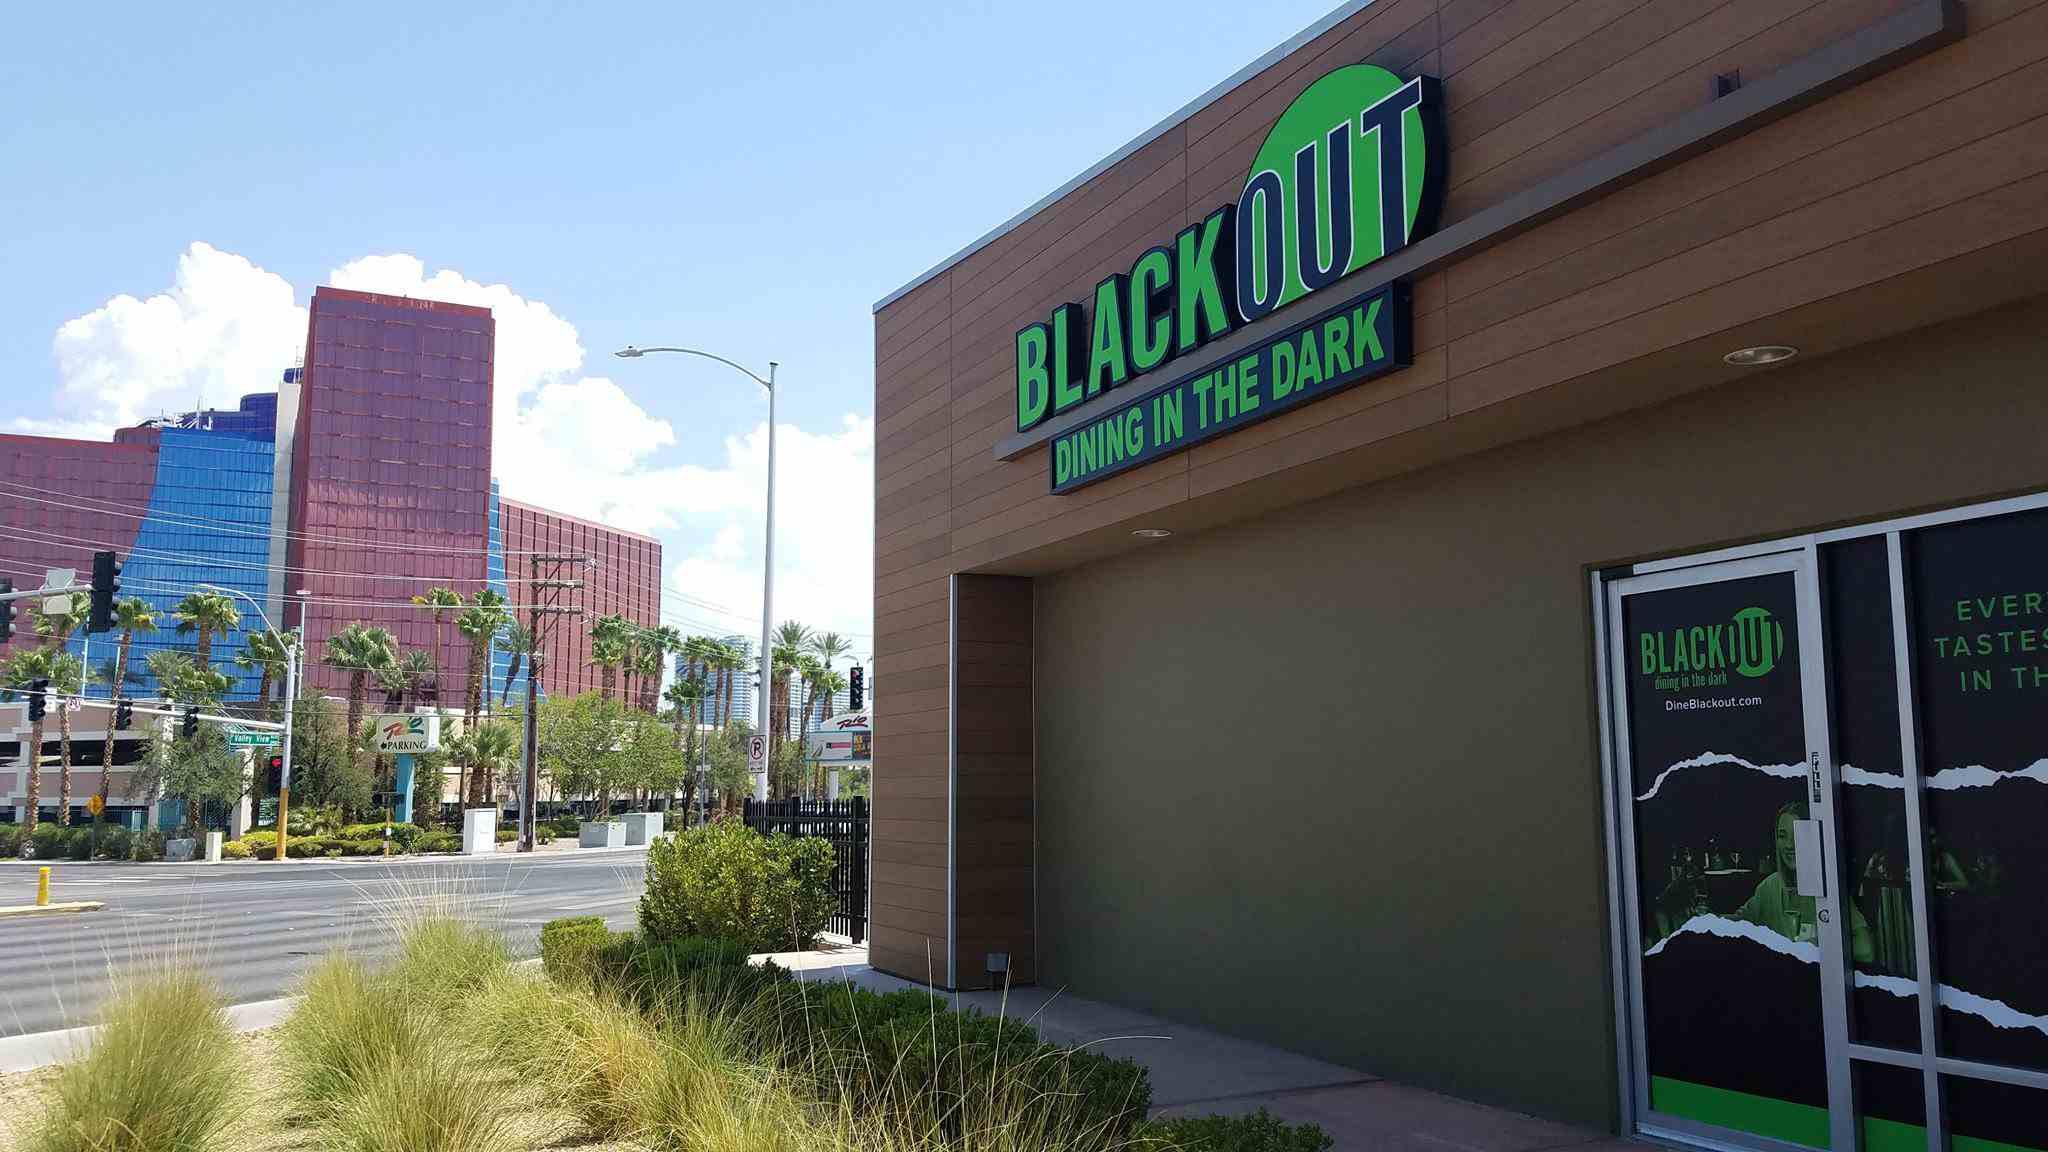 Exterior of the Blackout restaurant